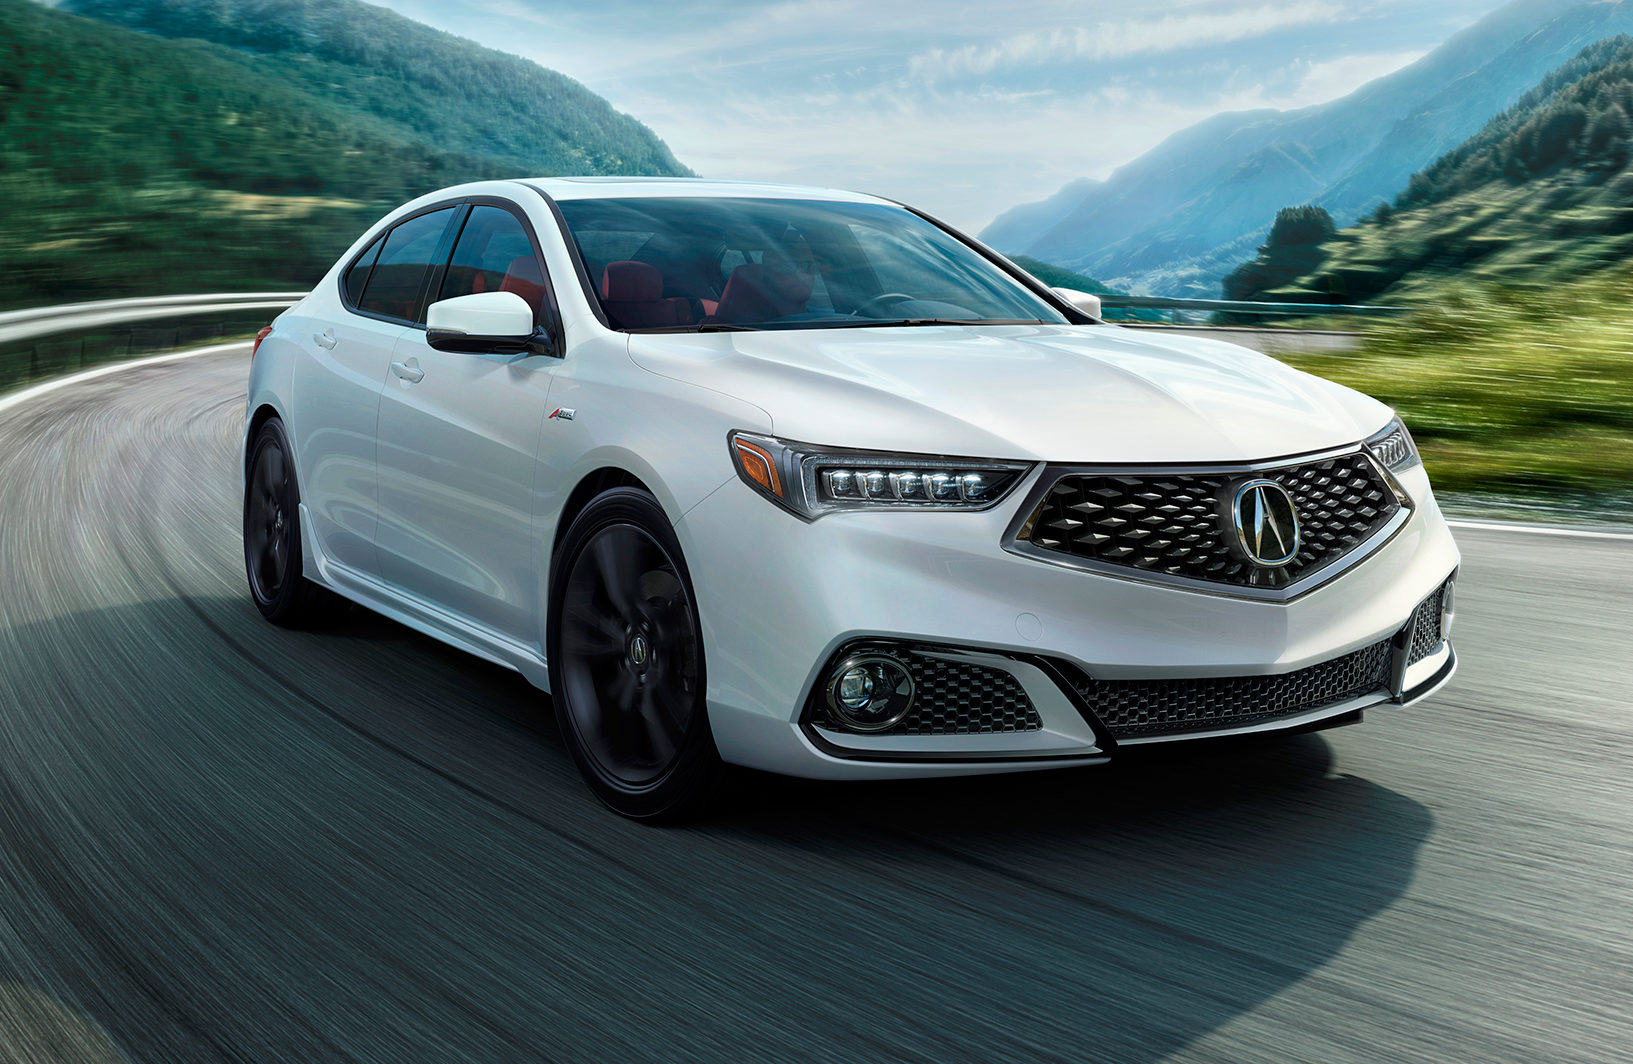 2018 Acura TLX A-Spec (source: www.acura.com)